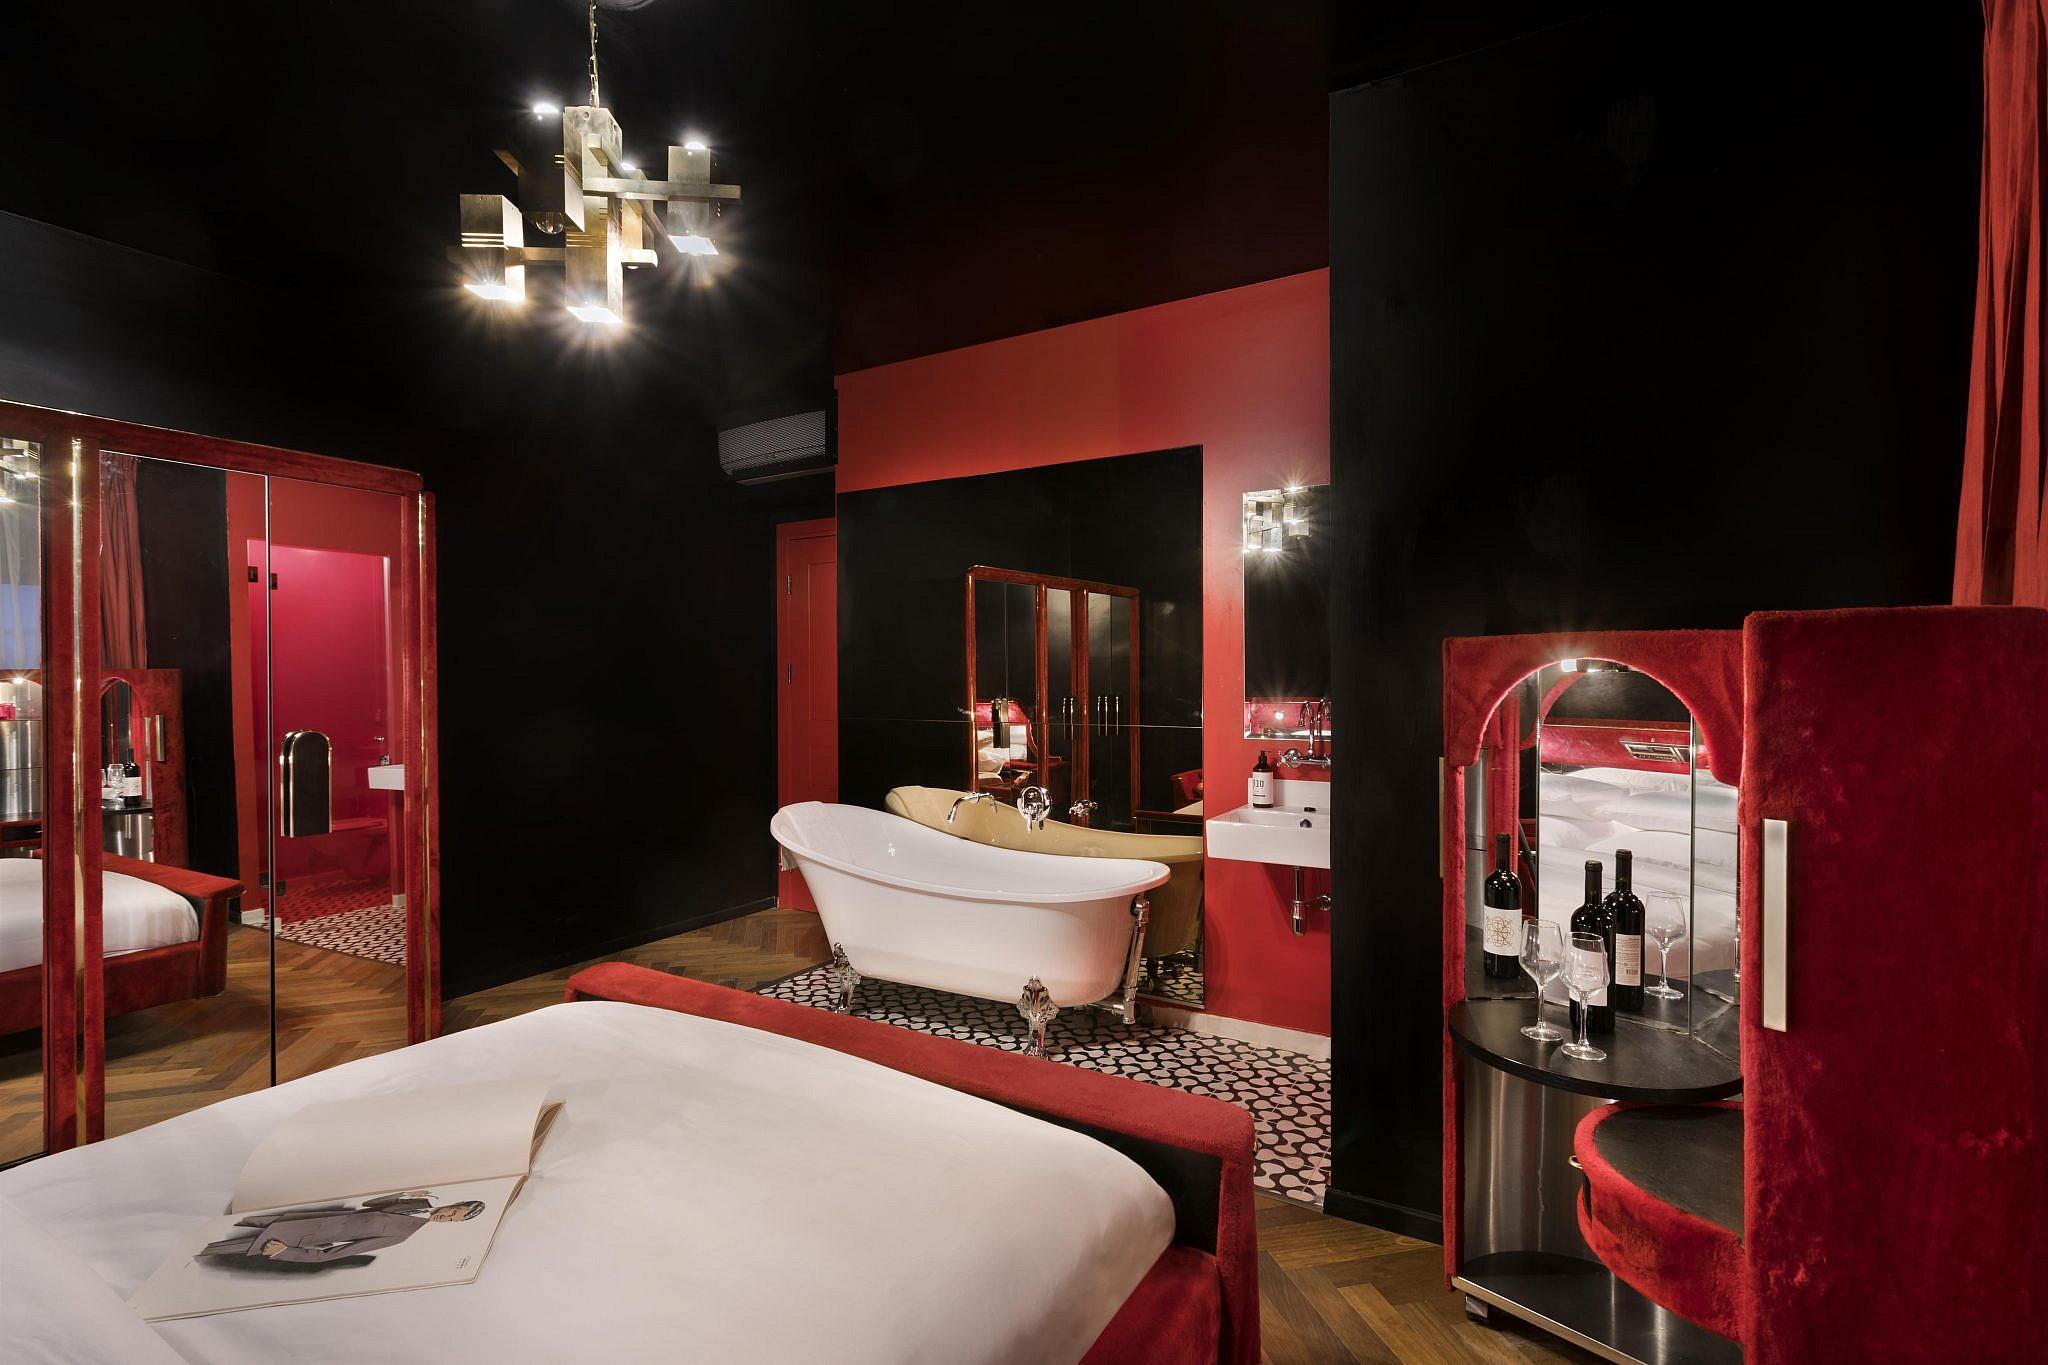 מלון דייב גורדון | צילום: אסף פינצ'וק